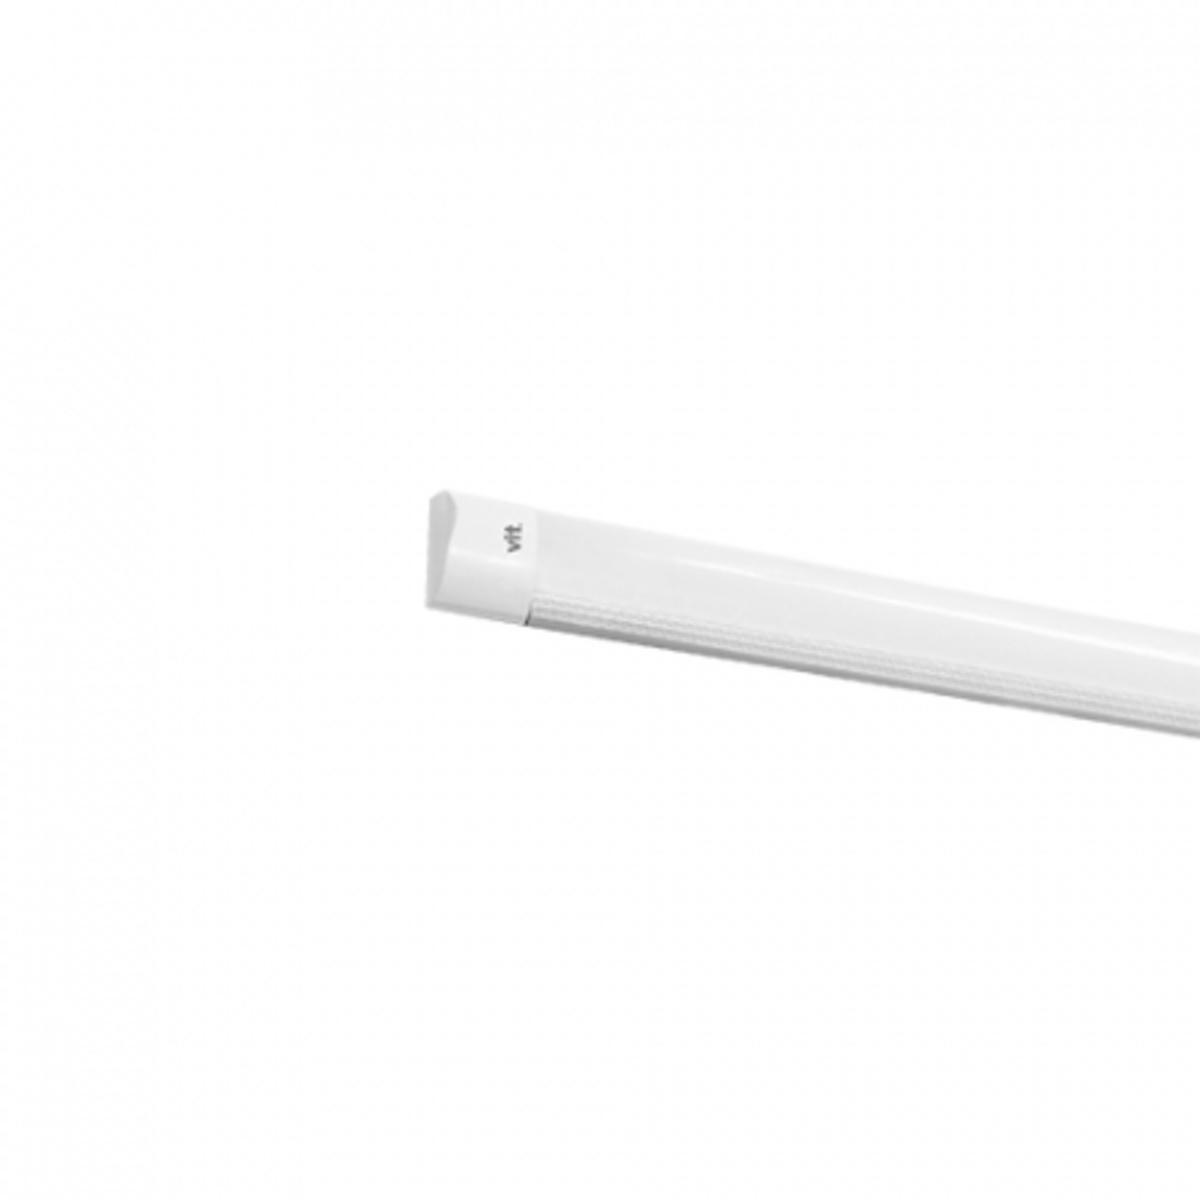 Eletriza - Eletriza Materiais Elétricos, Hidráulicos e Automação Industrial - LUMINARIA  LED SOB LINEAR 72W 6500K 3600-4000lm (SLIM) 100-265V LL72W VIT